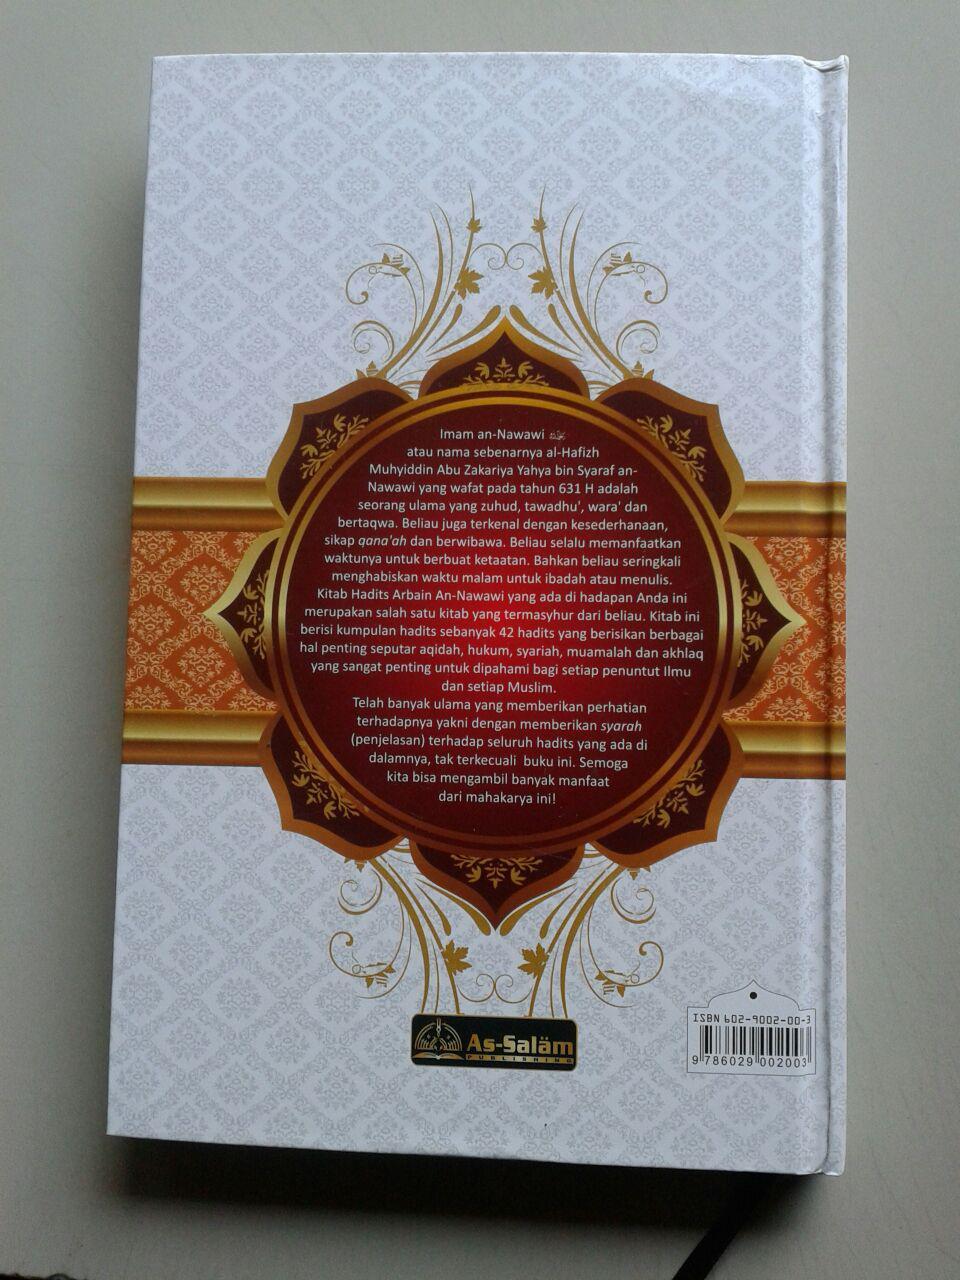 Buku Syarah Hadits Arba'in An-Nawawiyah cover